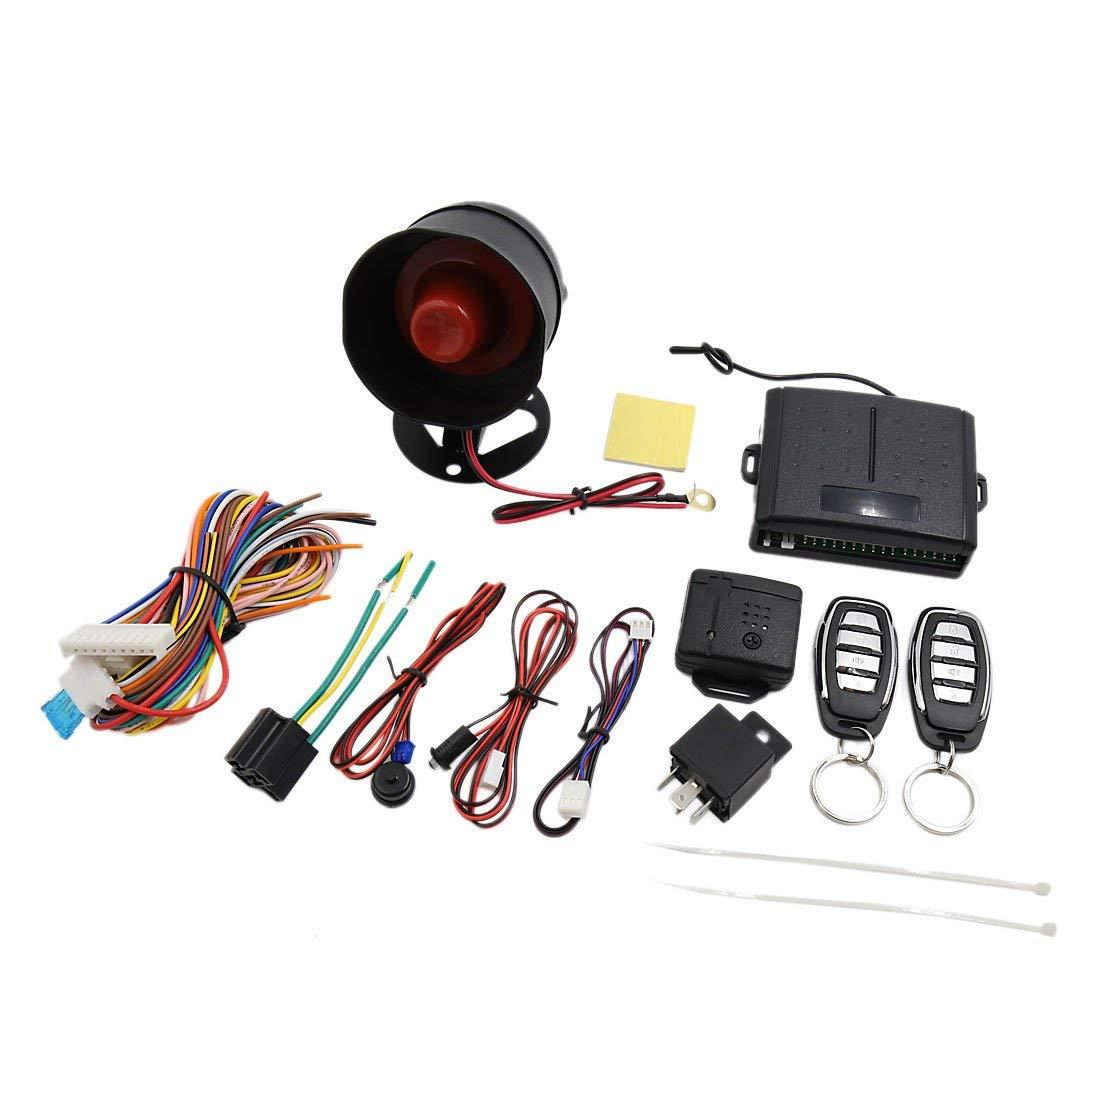 uxcell Car Alarm Security System Manual Reset Button Burglar Alarm Protection DC 12V